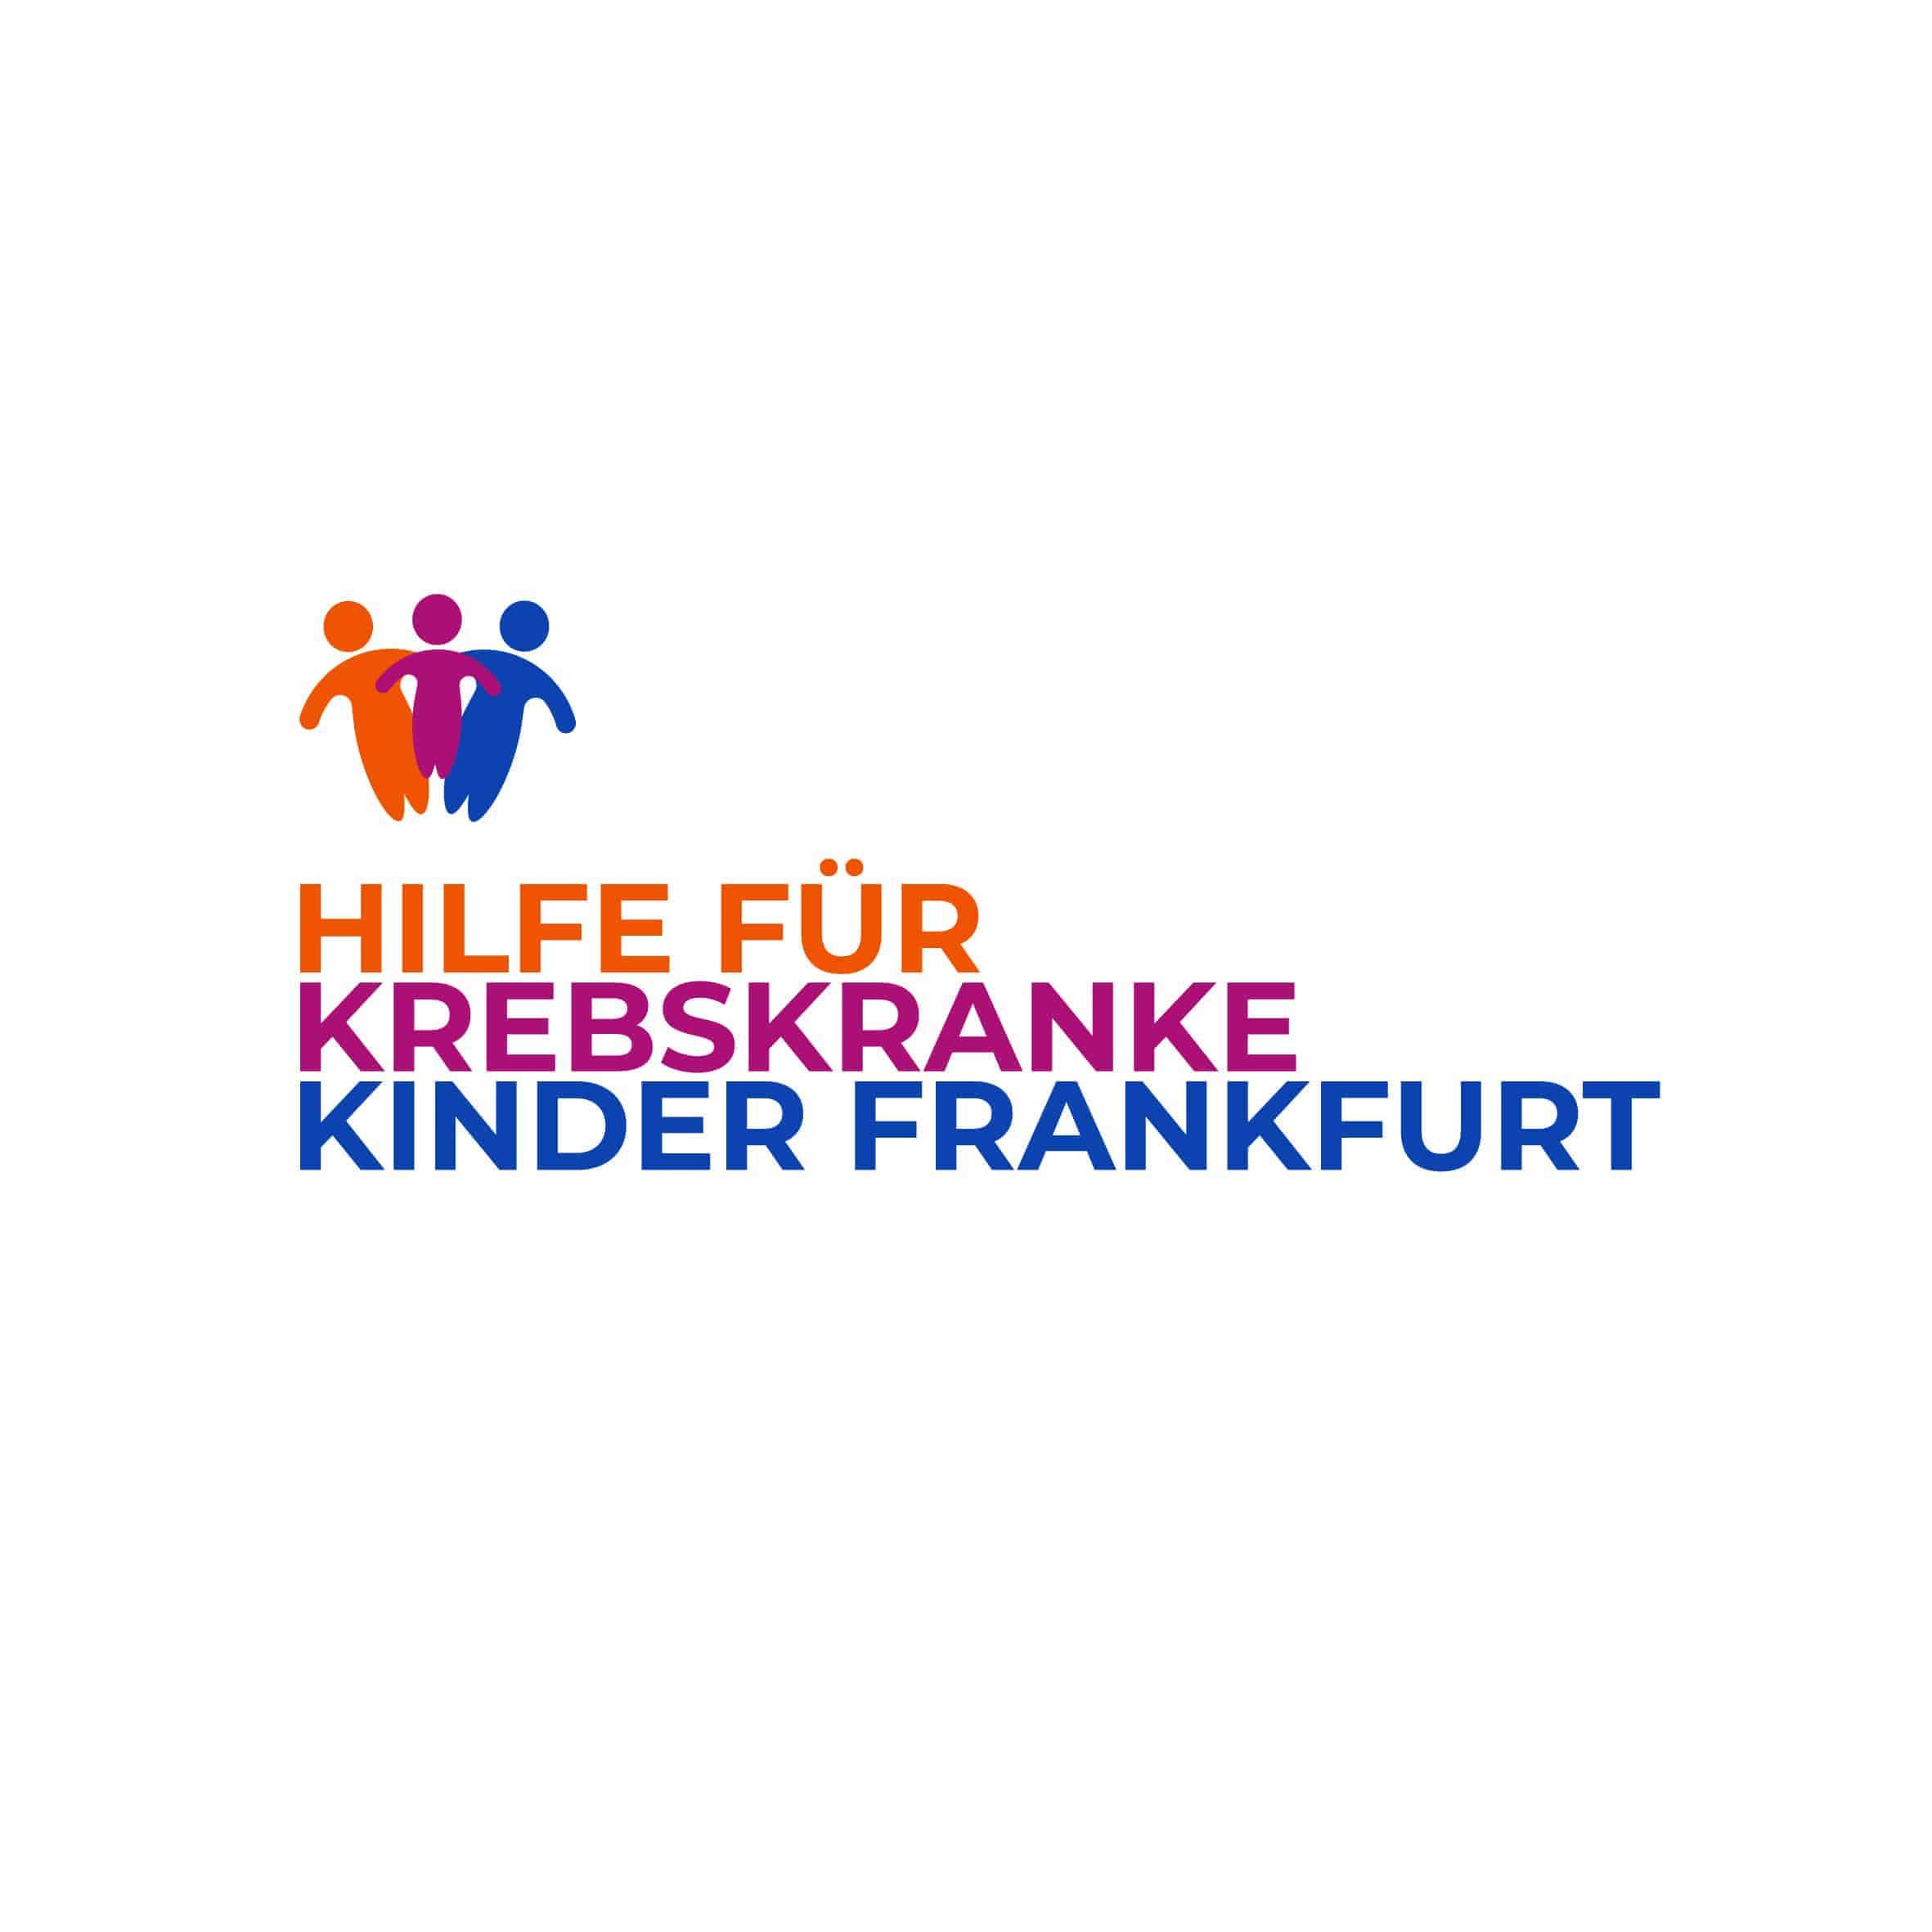 Verein Hilfe für krebskranke Kinder Frankfurt e.V.